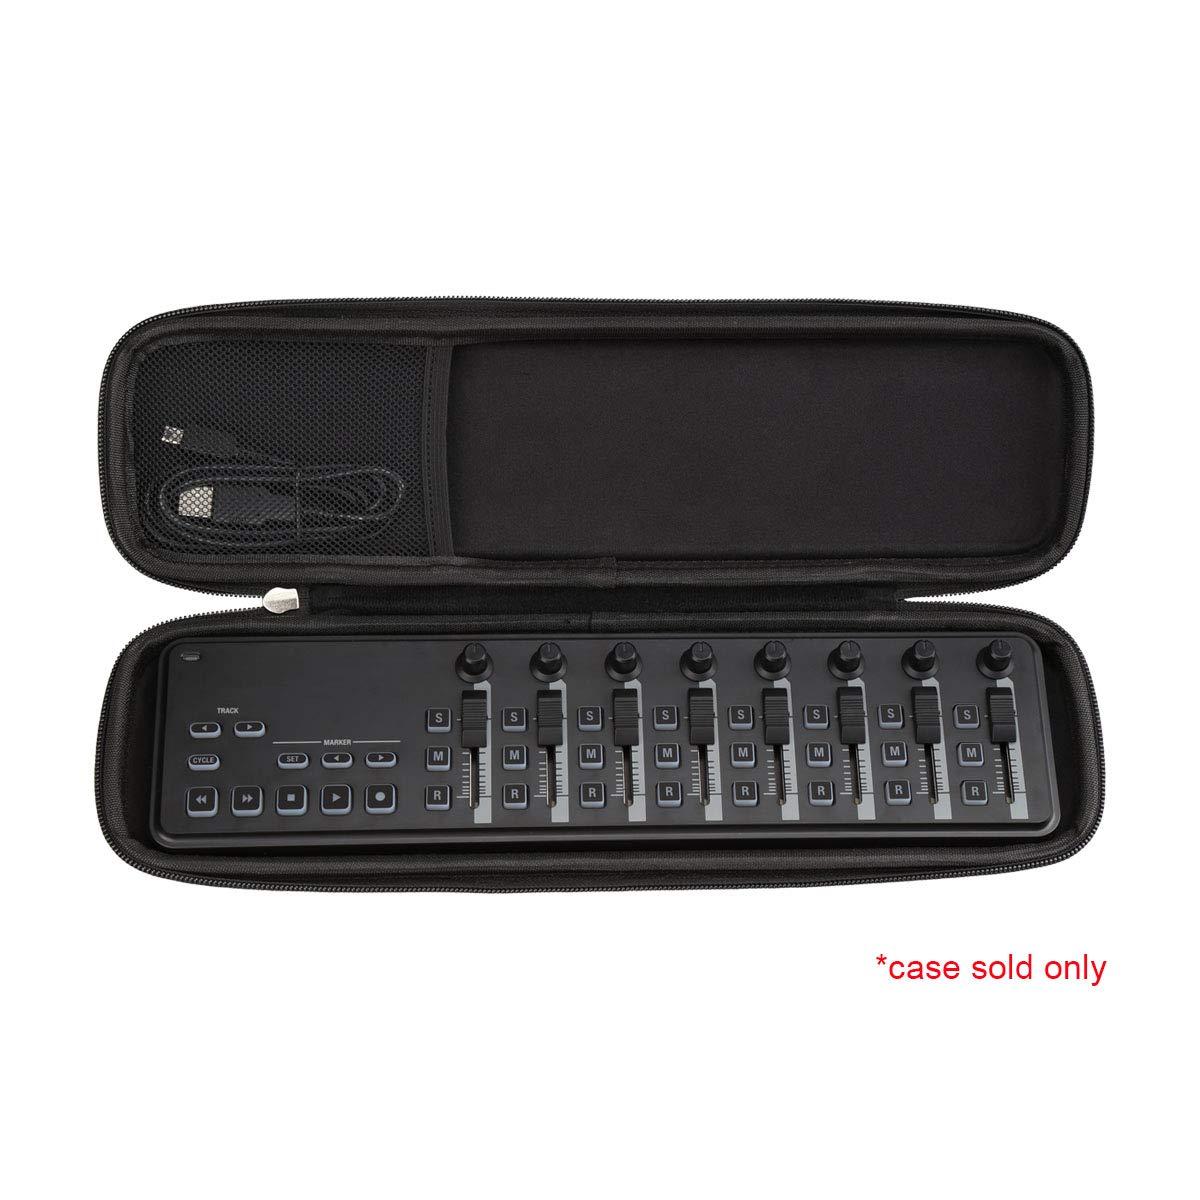 Aproca Hard Travel Protective Case compatible with KORG nanoKONTROL2 / NANOKEY2WH / nanoPAD2 Slim-Line USB Control Surface/MIDI Pads by Aproca